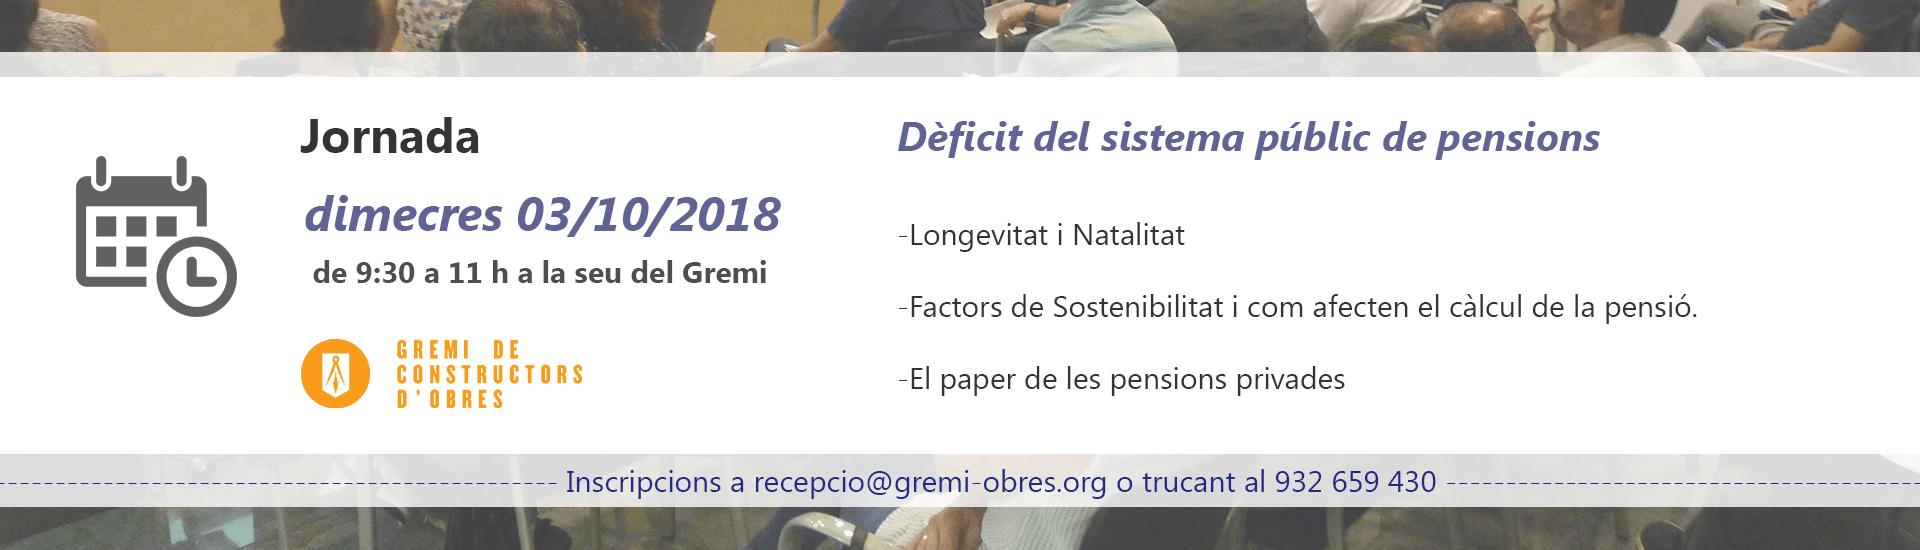 JORNADA JORI armengol pensions (1)